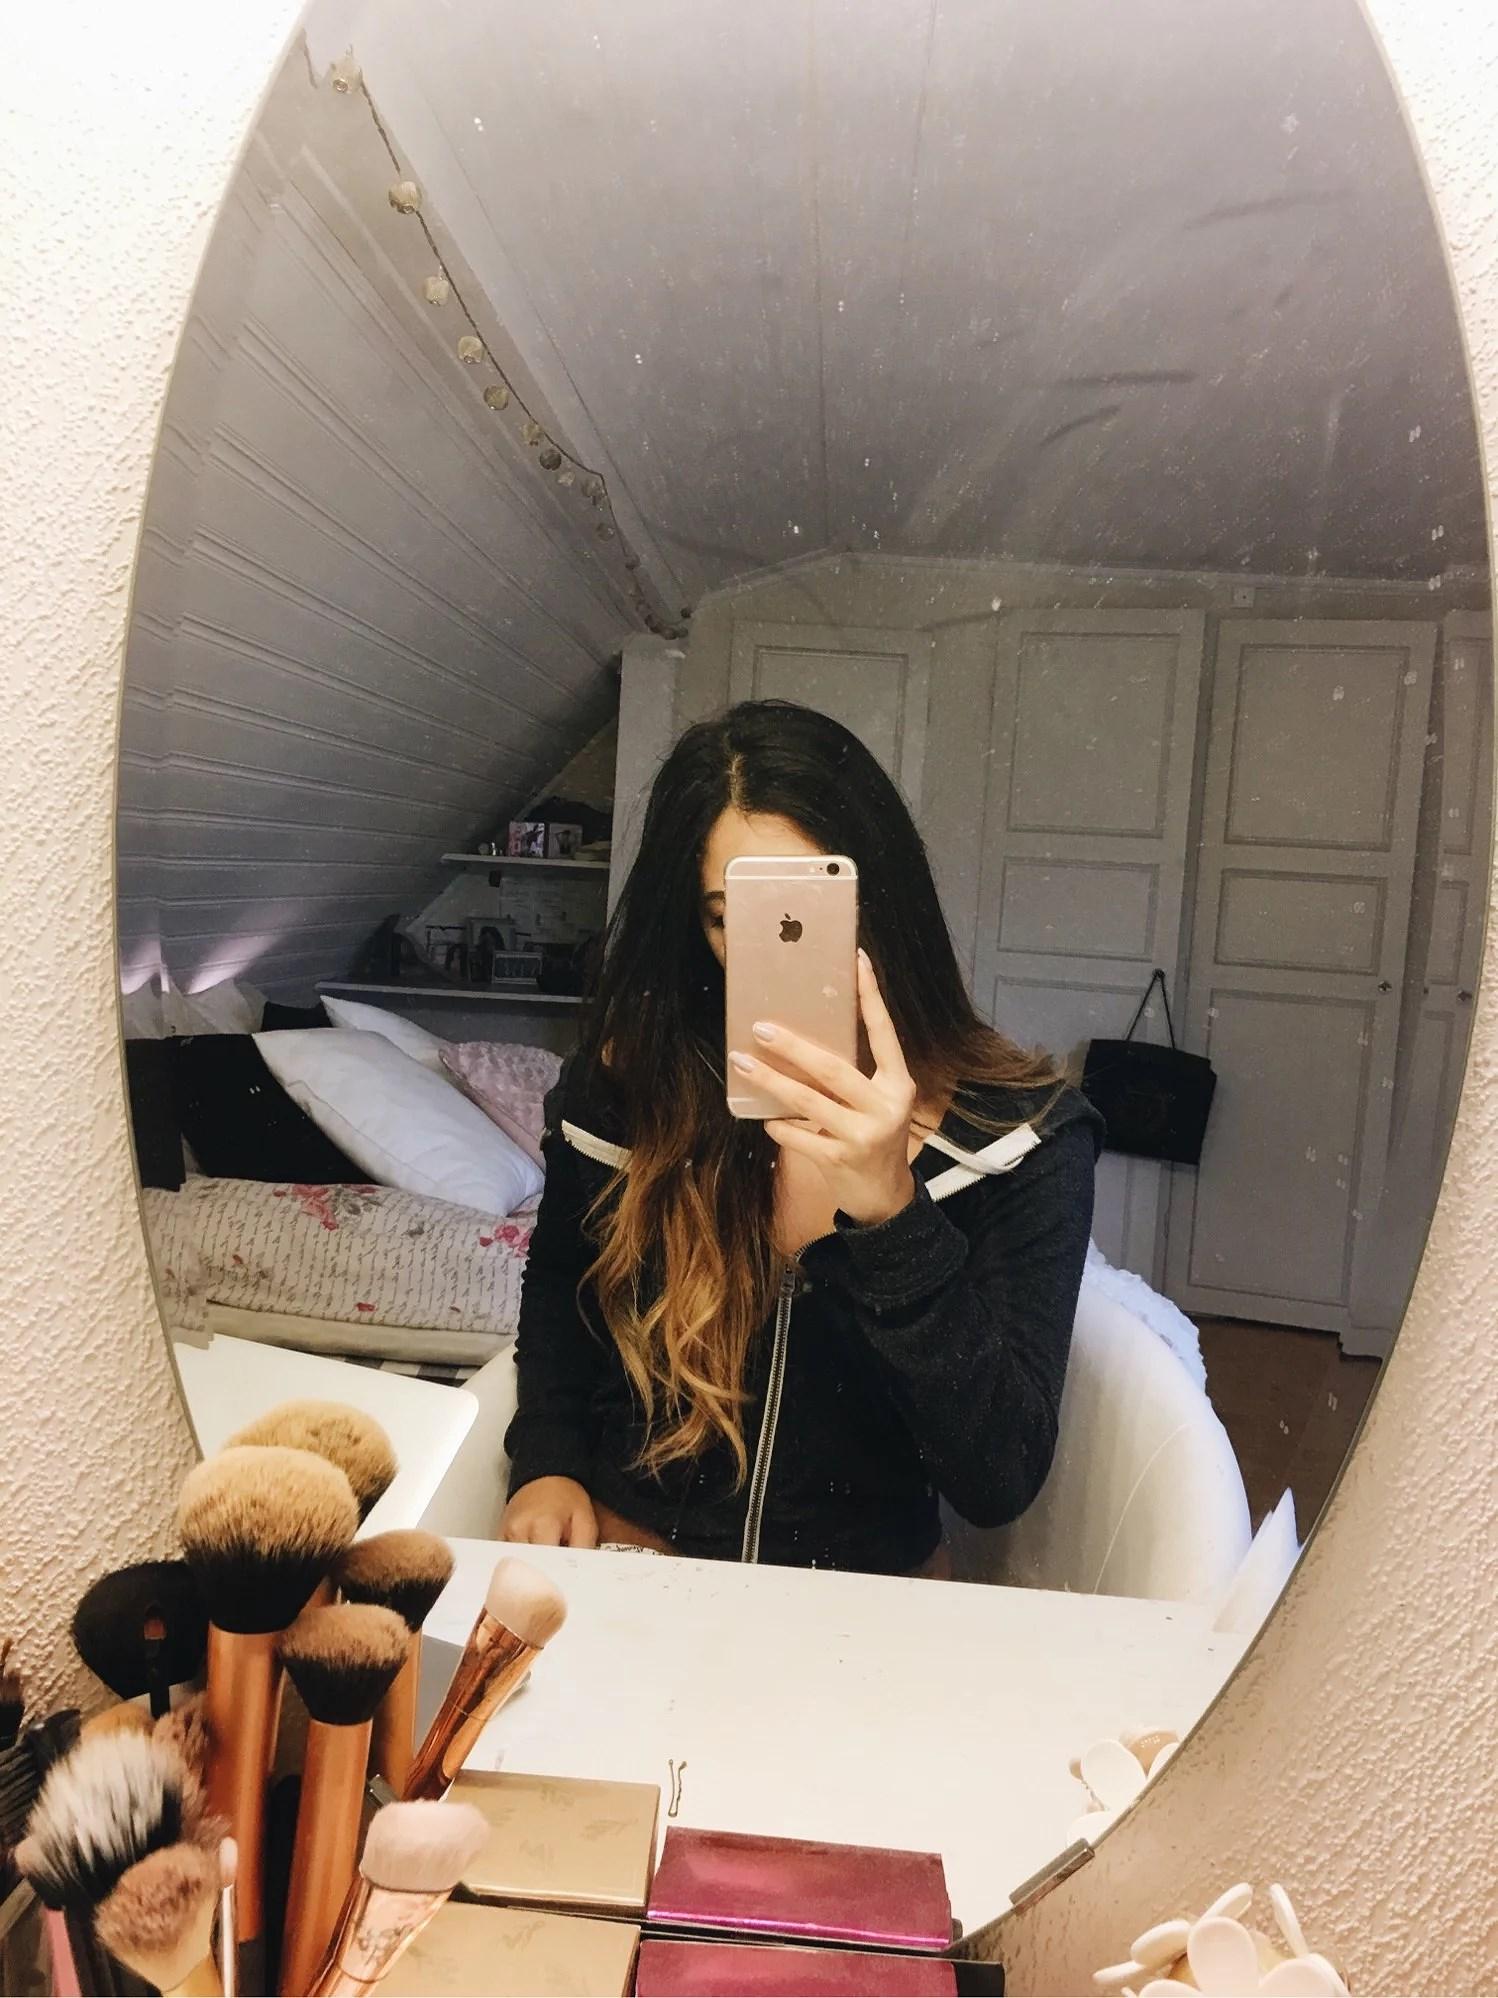 12:58 PM